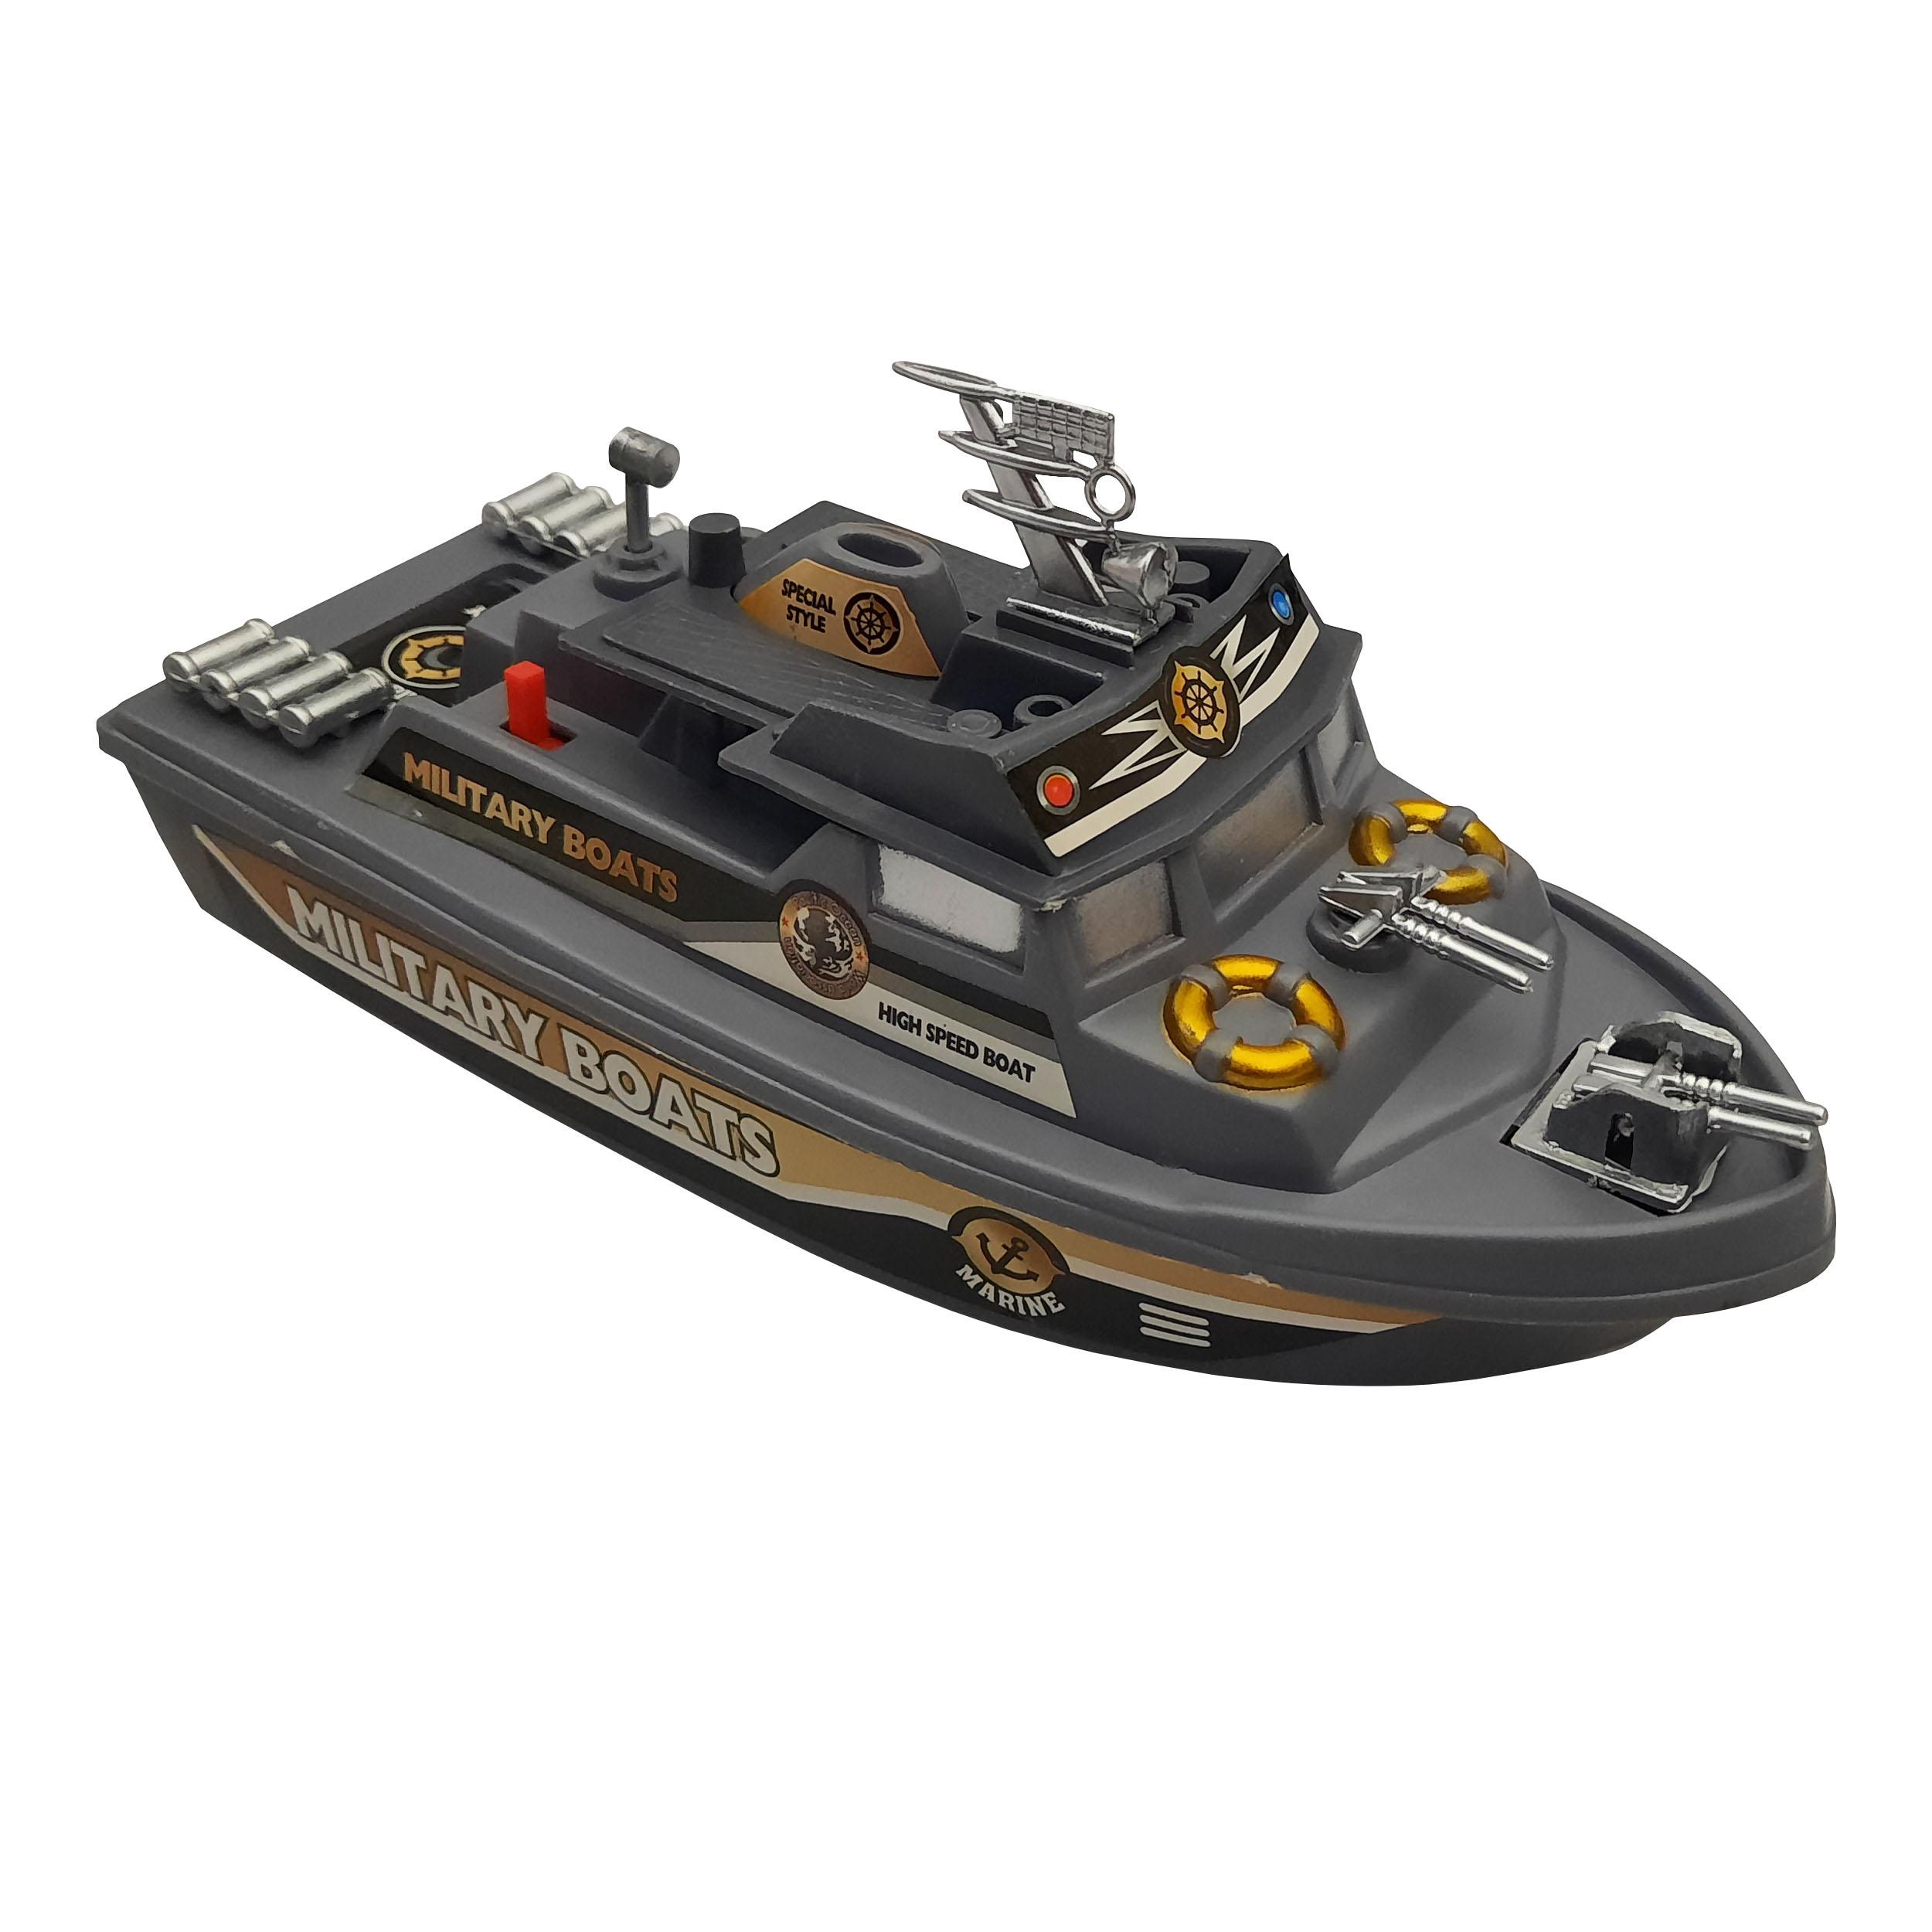 کشتی بازی طرح ناو جنگی مدل MARINE کد 0679